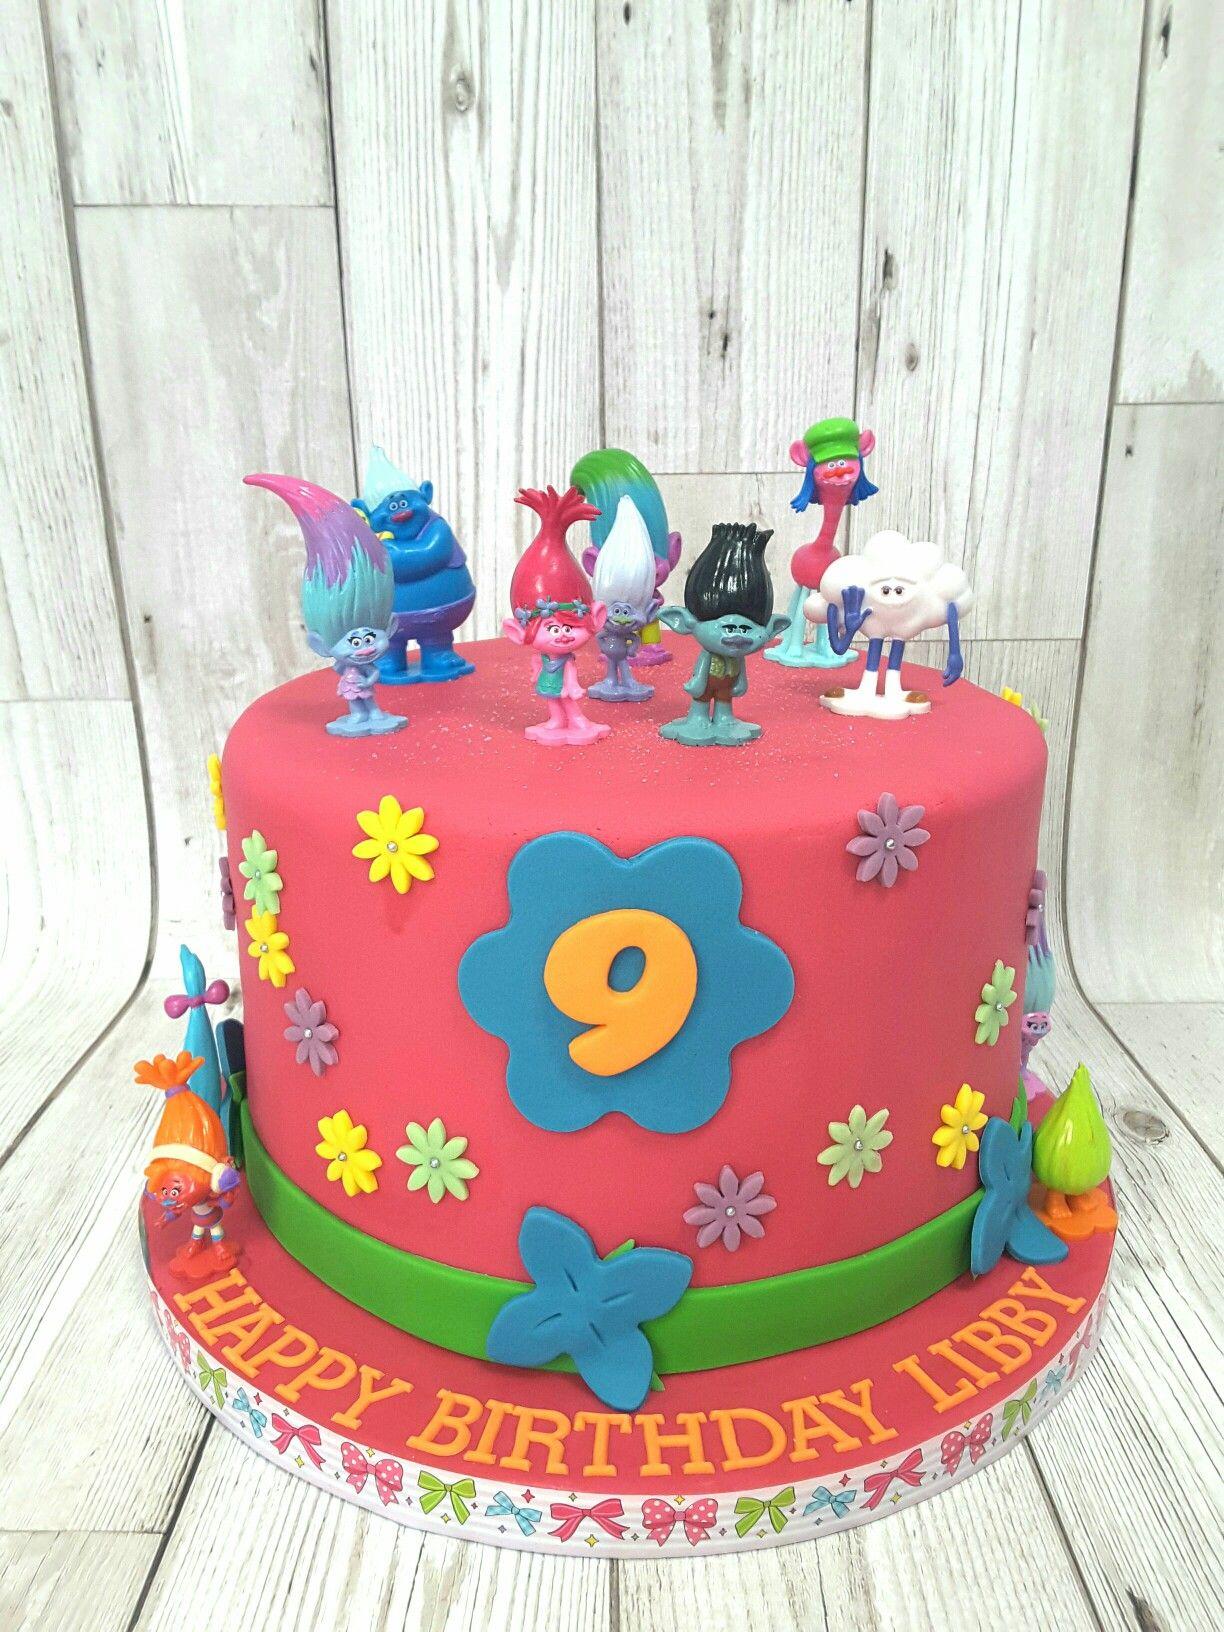 Image Result For Disney Trolls Cake Ideas Jadyns Bday Ideas - Disney birthday cake ideas